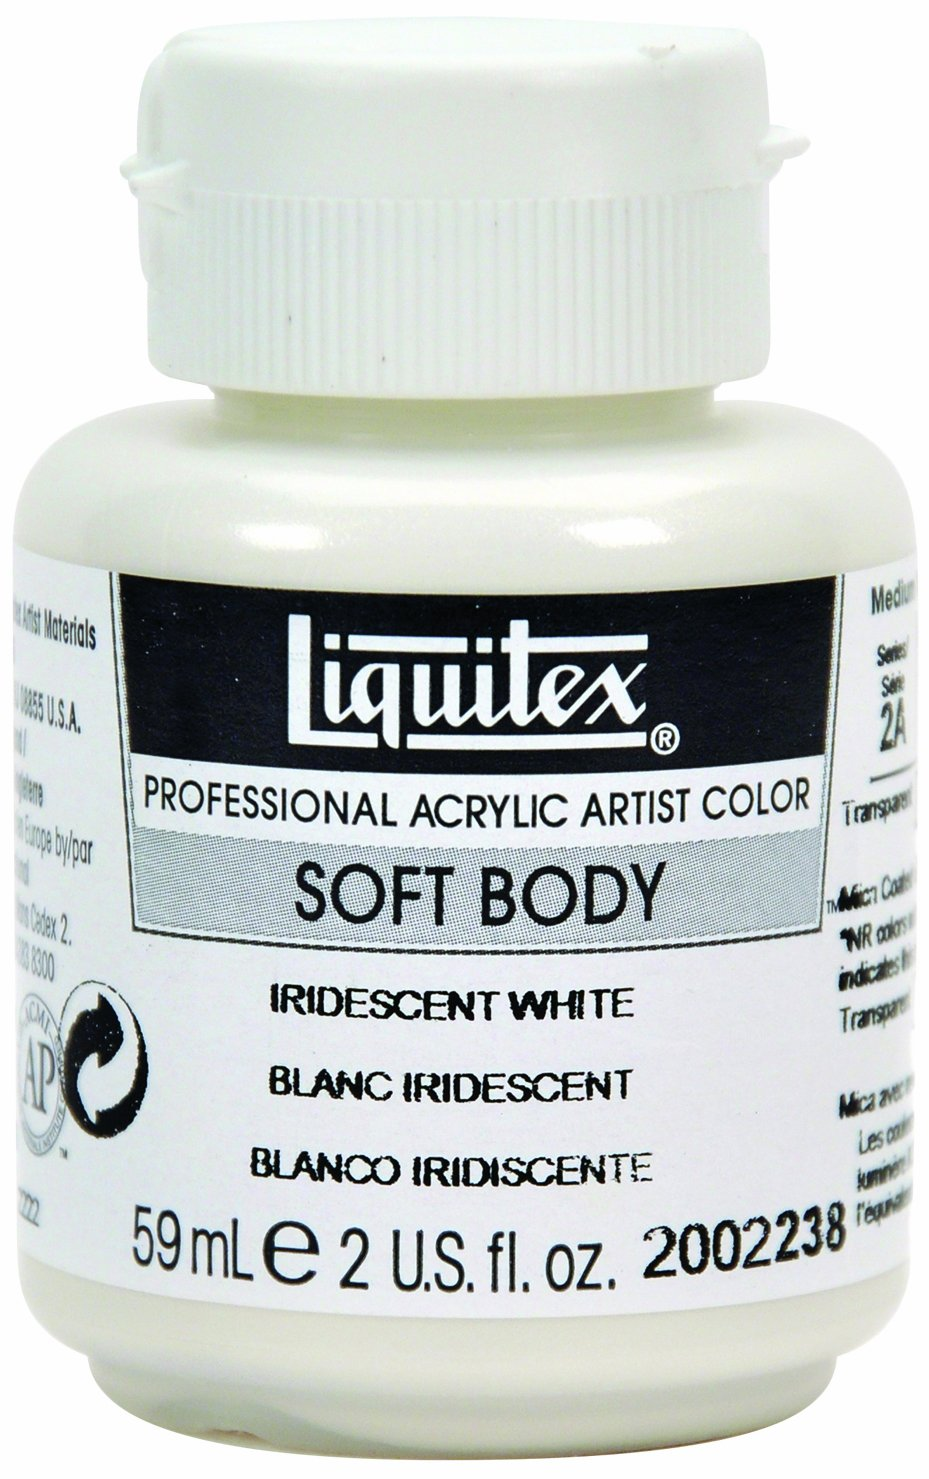 Liquitex Professional Soft Body Acrylic Paint 2-oz jar, Iridescent White